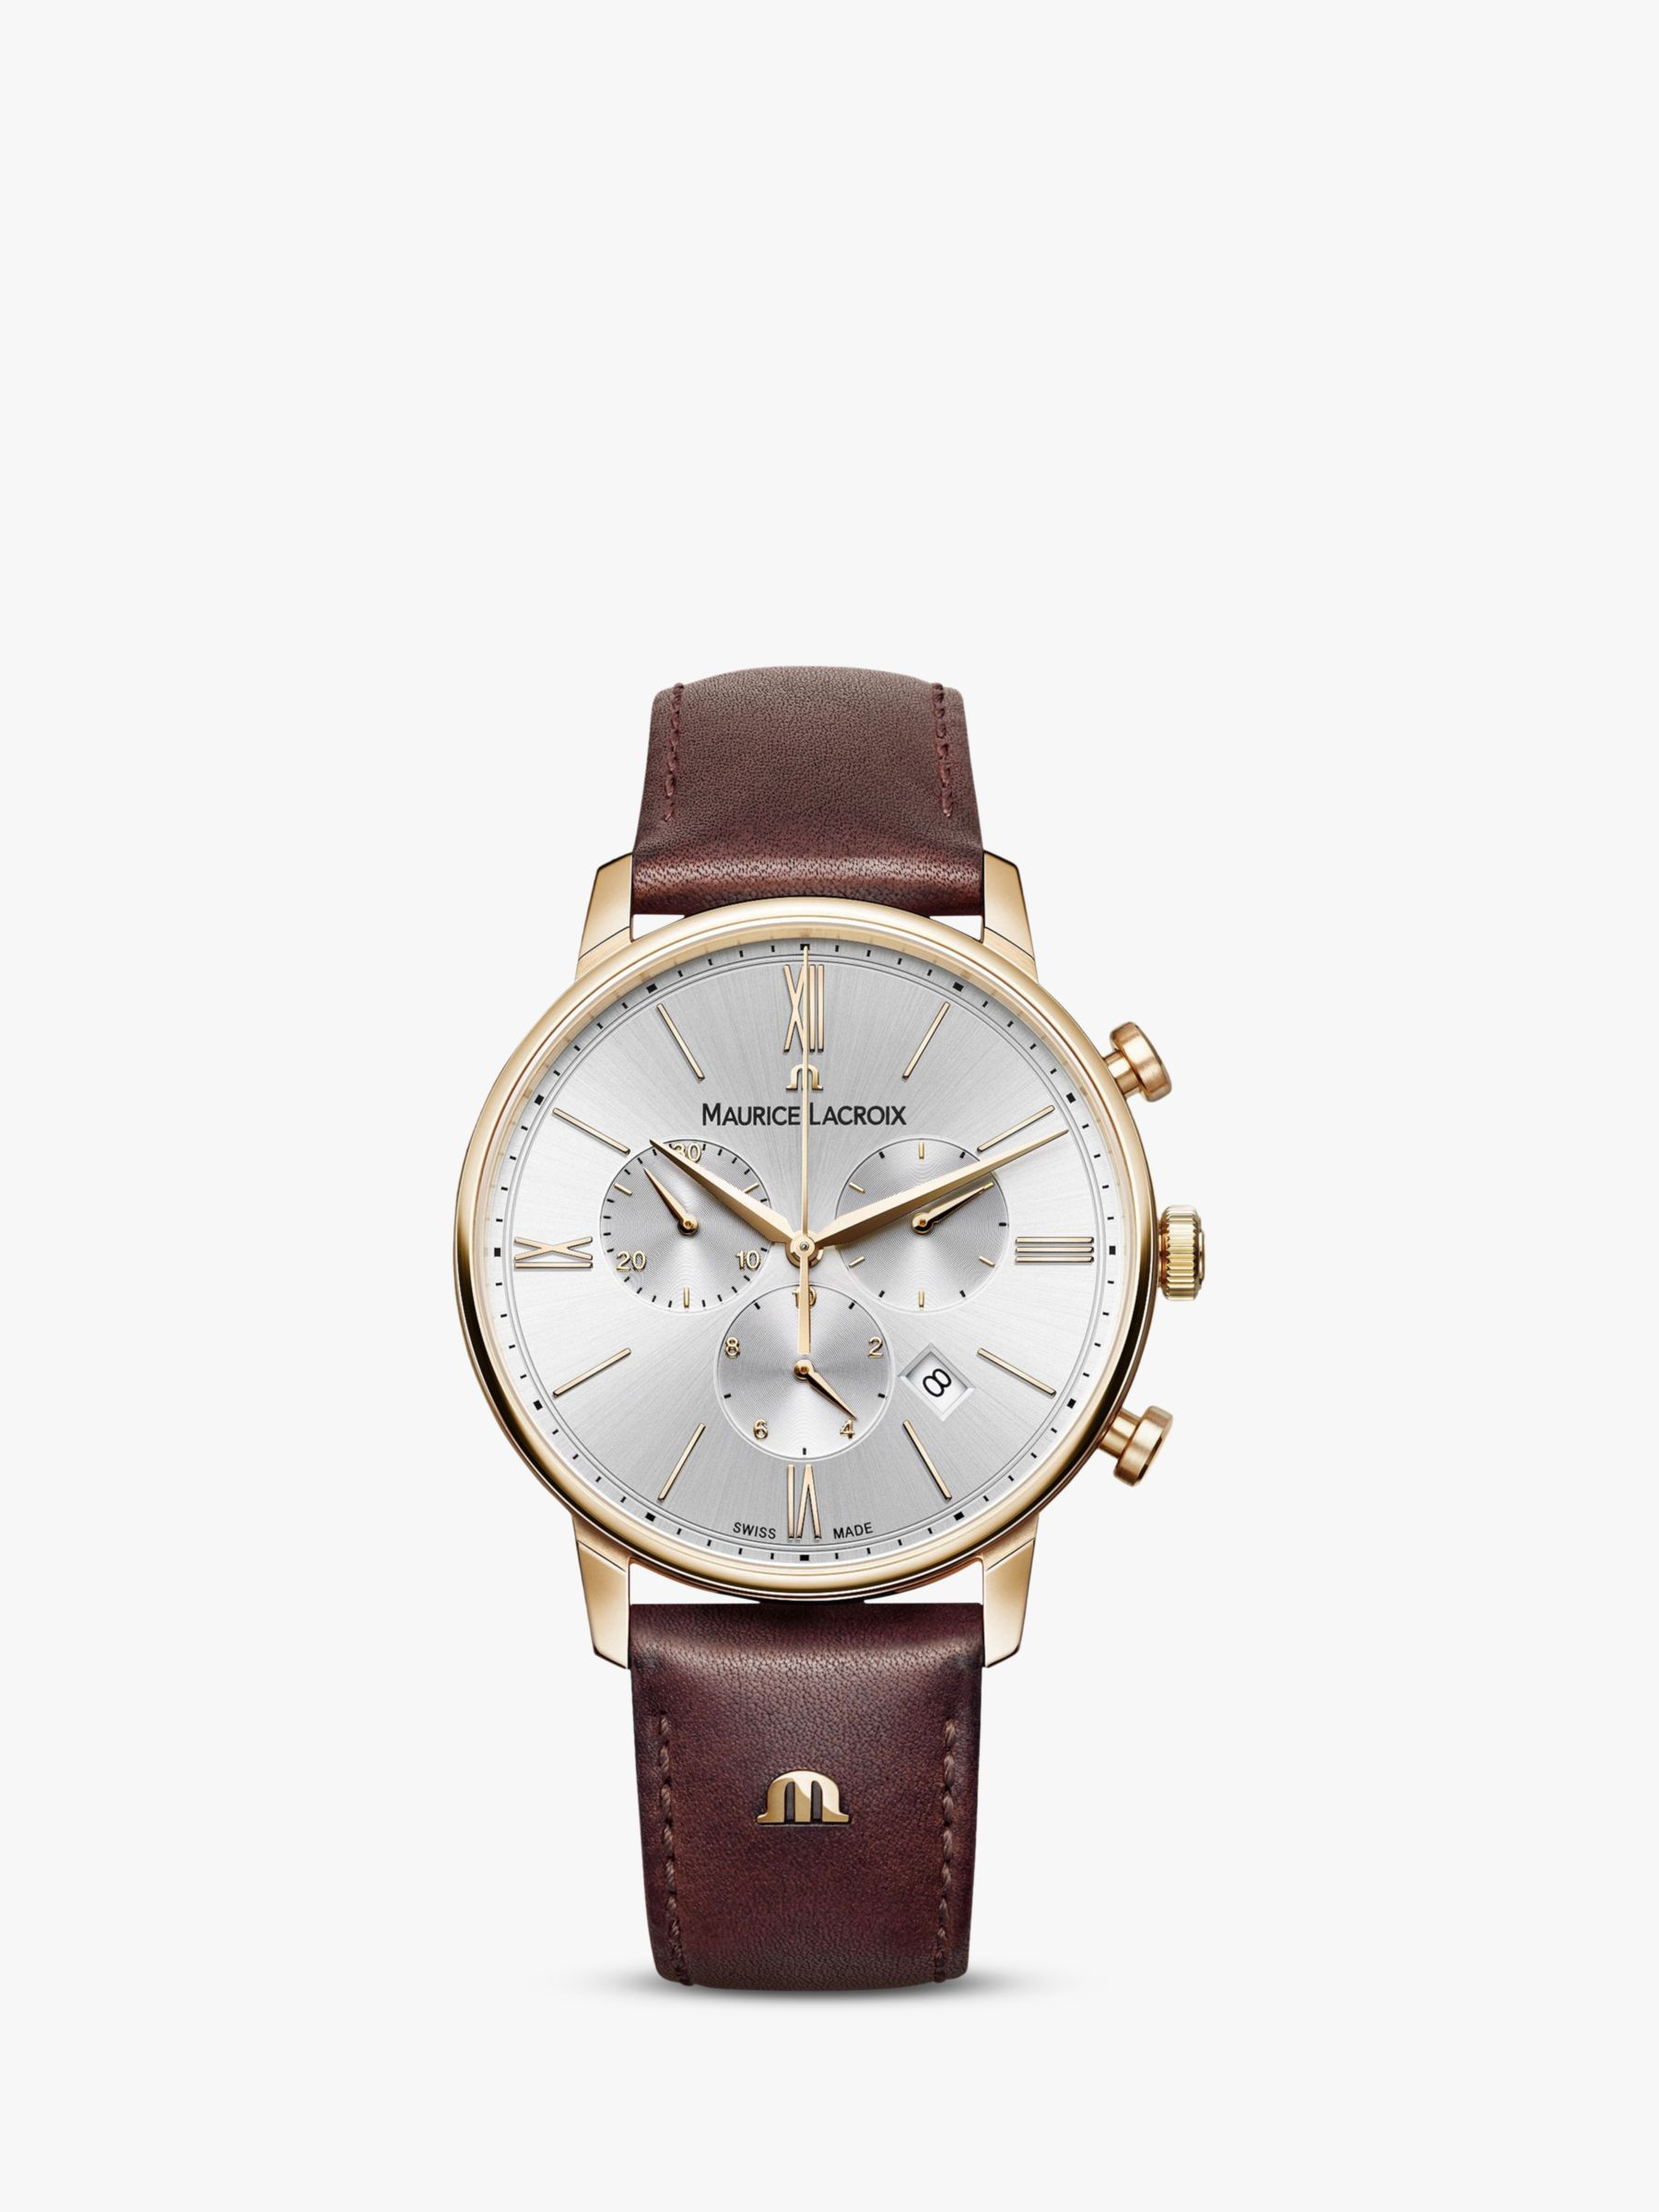 Maurice Lacroix Maurice Lacroix EL1098-PVP01-111-1 Men's Eliros Chronograph Date Leather Strap Watch, Brown/Silver